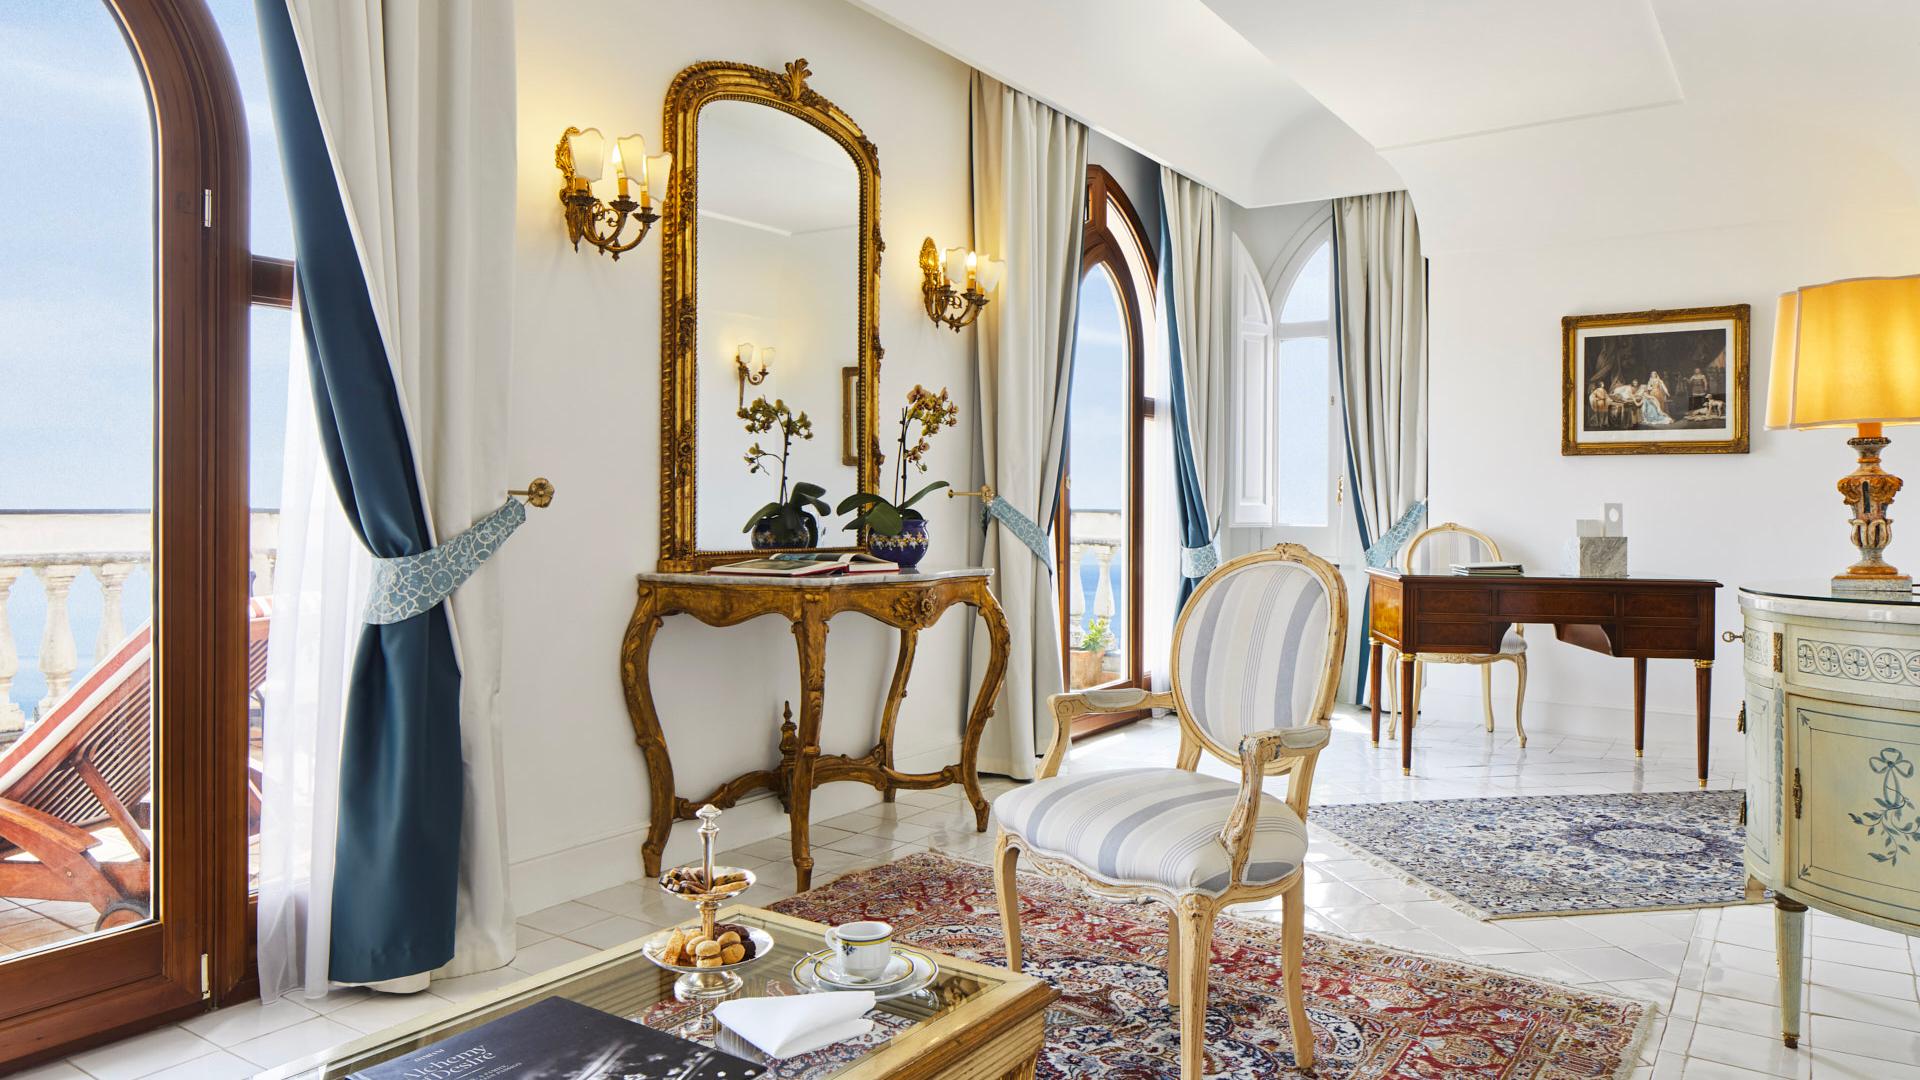 palazzo-avino-deluxe-suite-sea-view-and-terrace.jpg